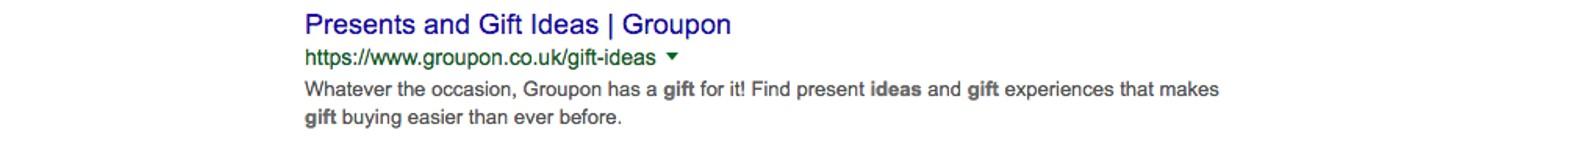 screenshot of meta description from Groupon